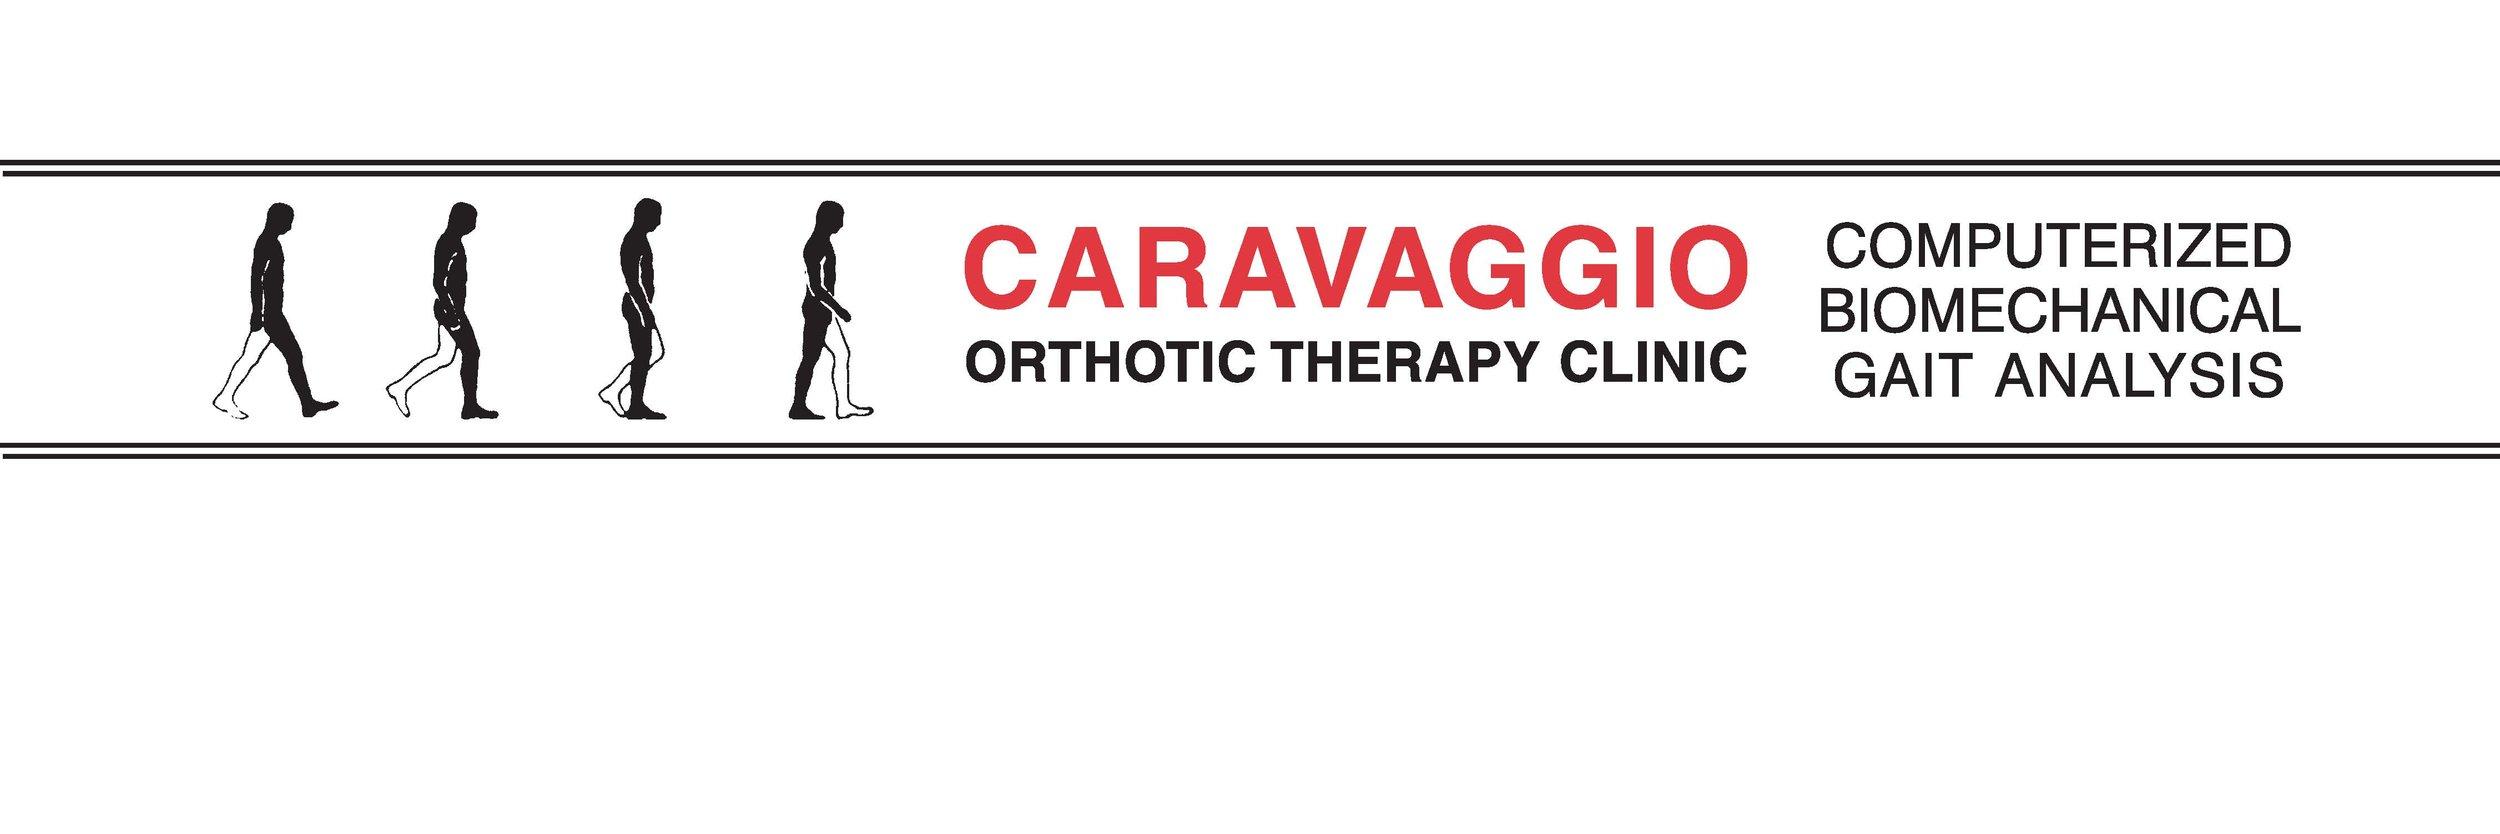 The Caravaggio Orthotic Clinic